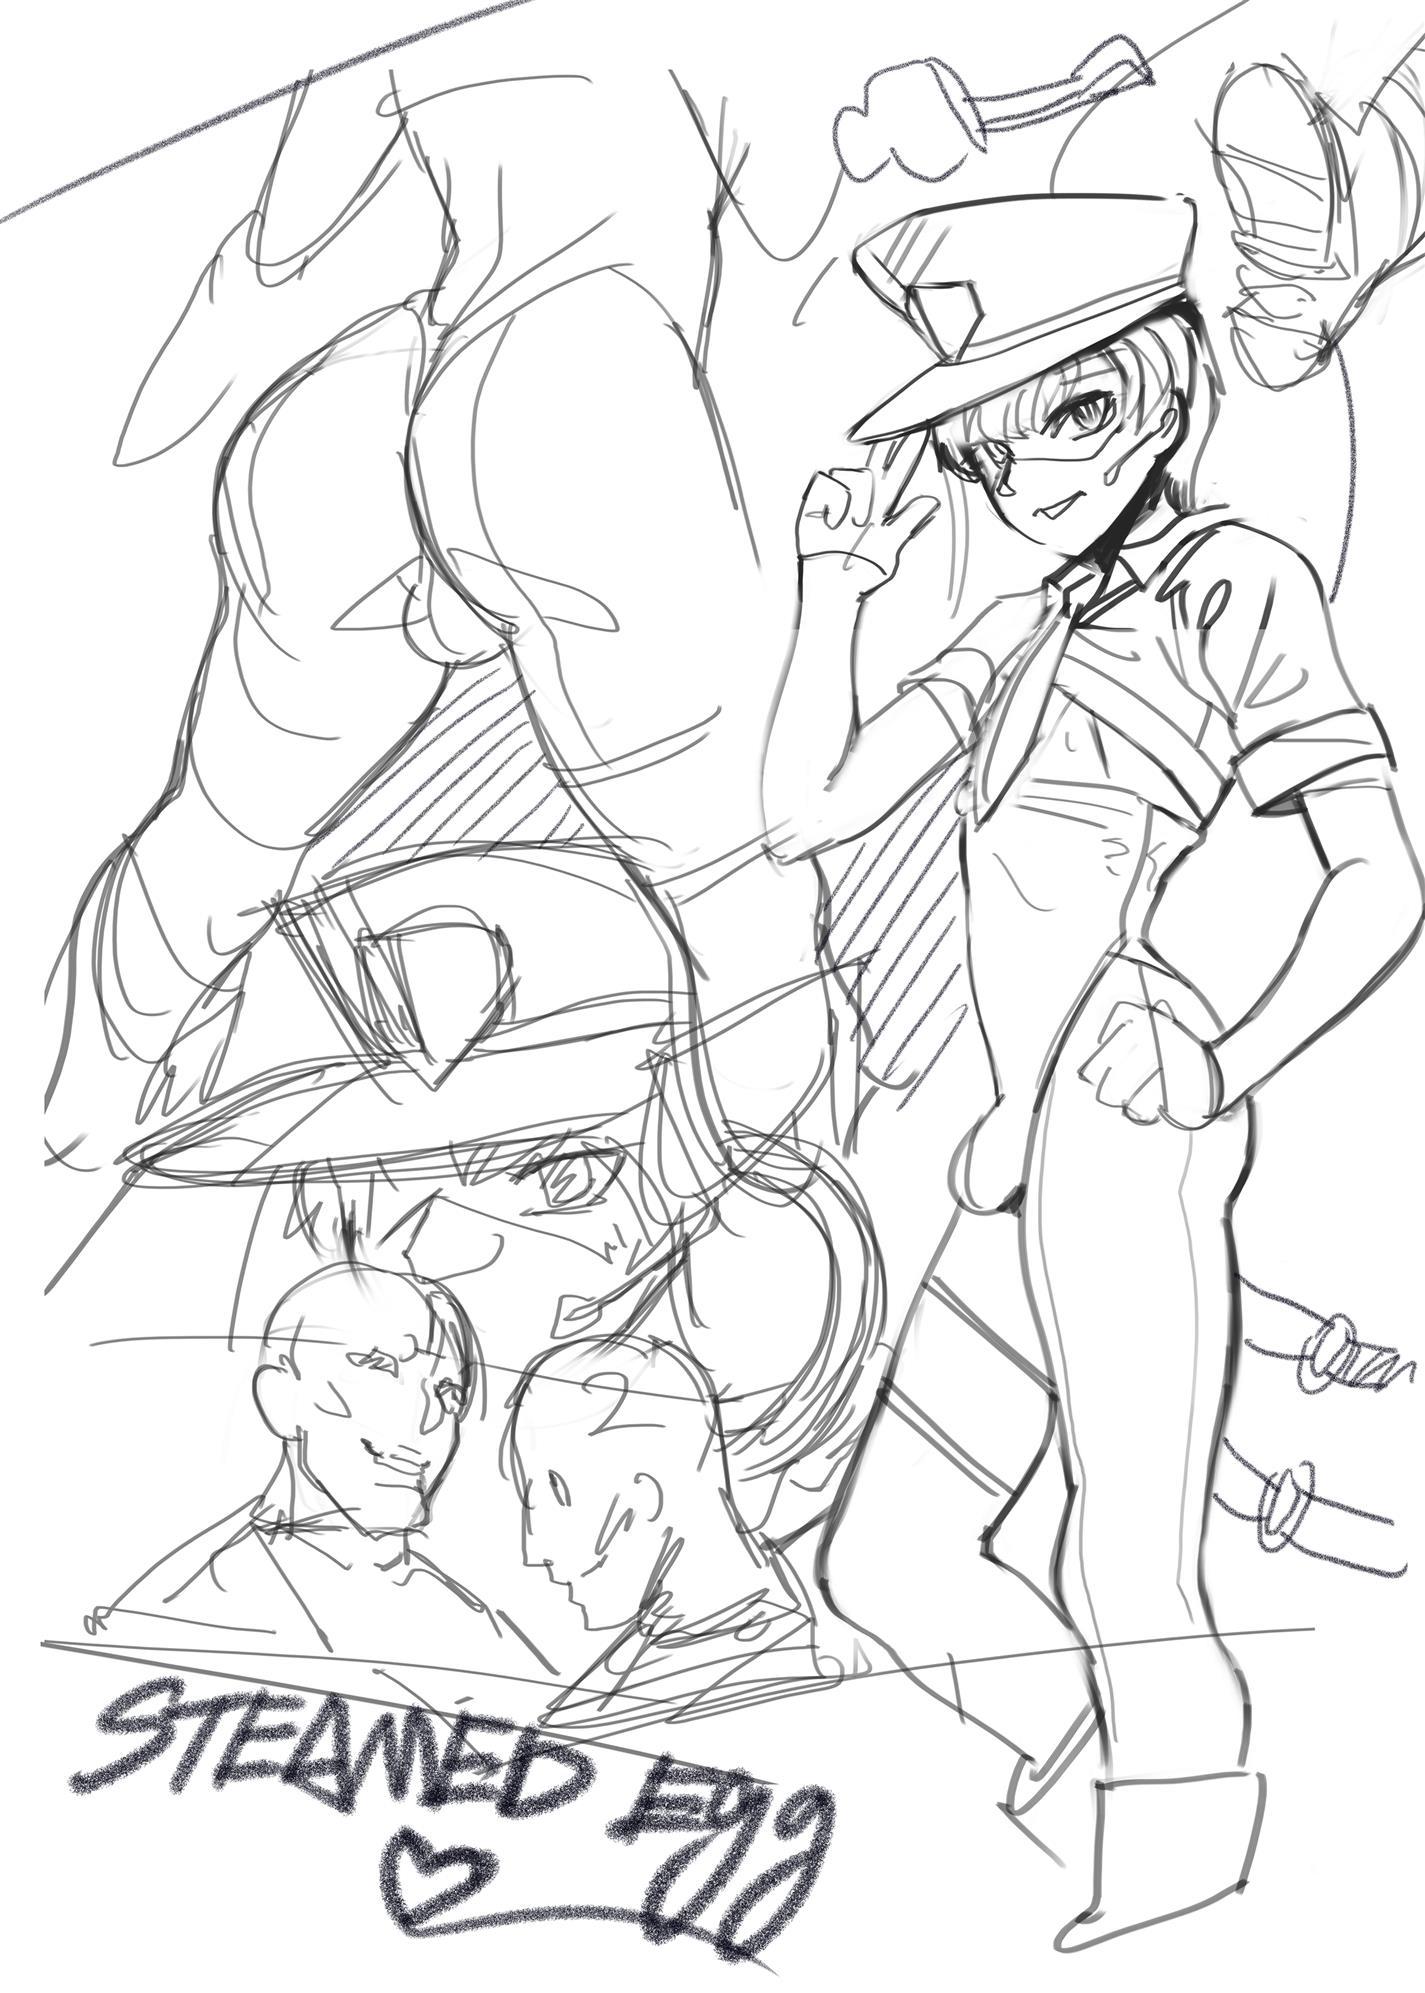 O garoto de uniforme